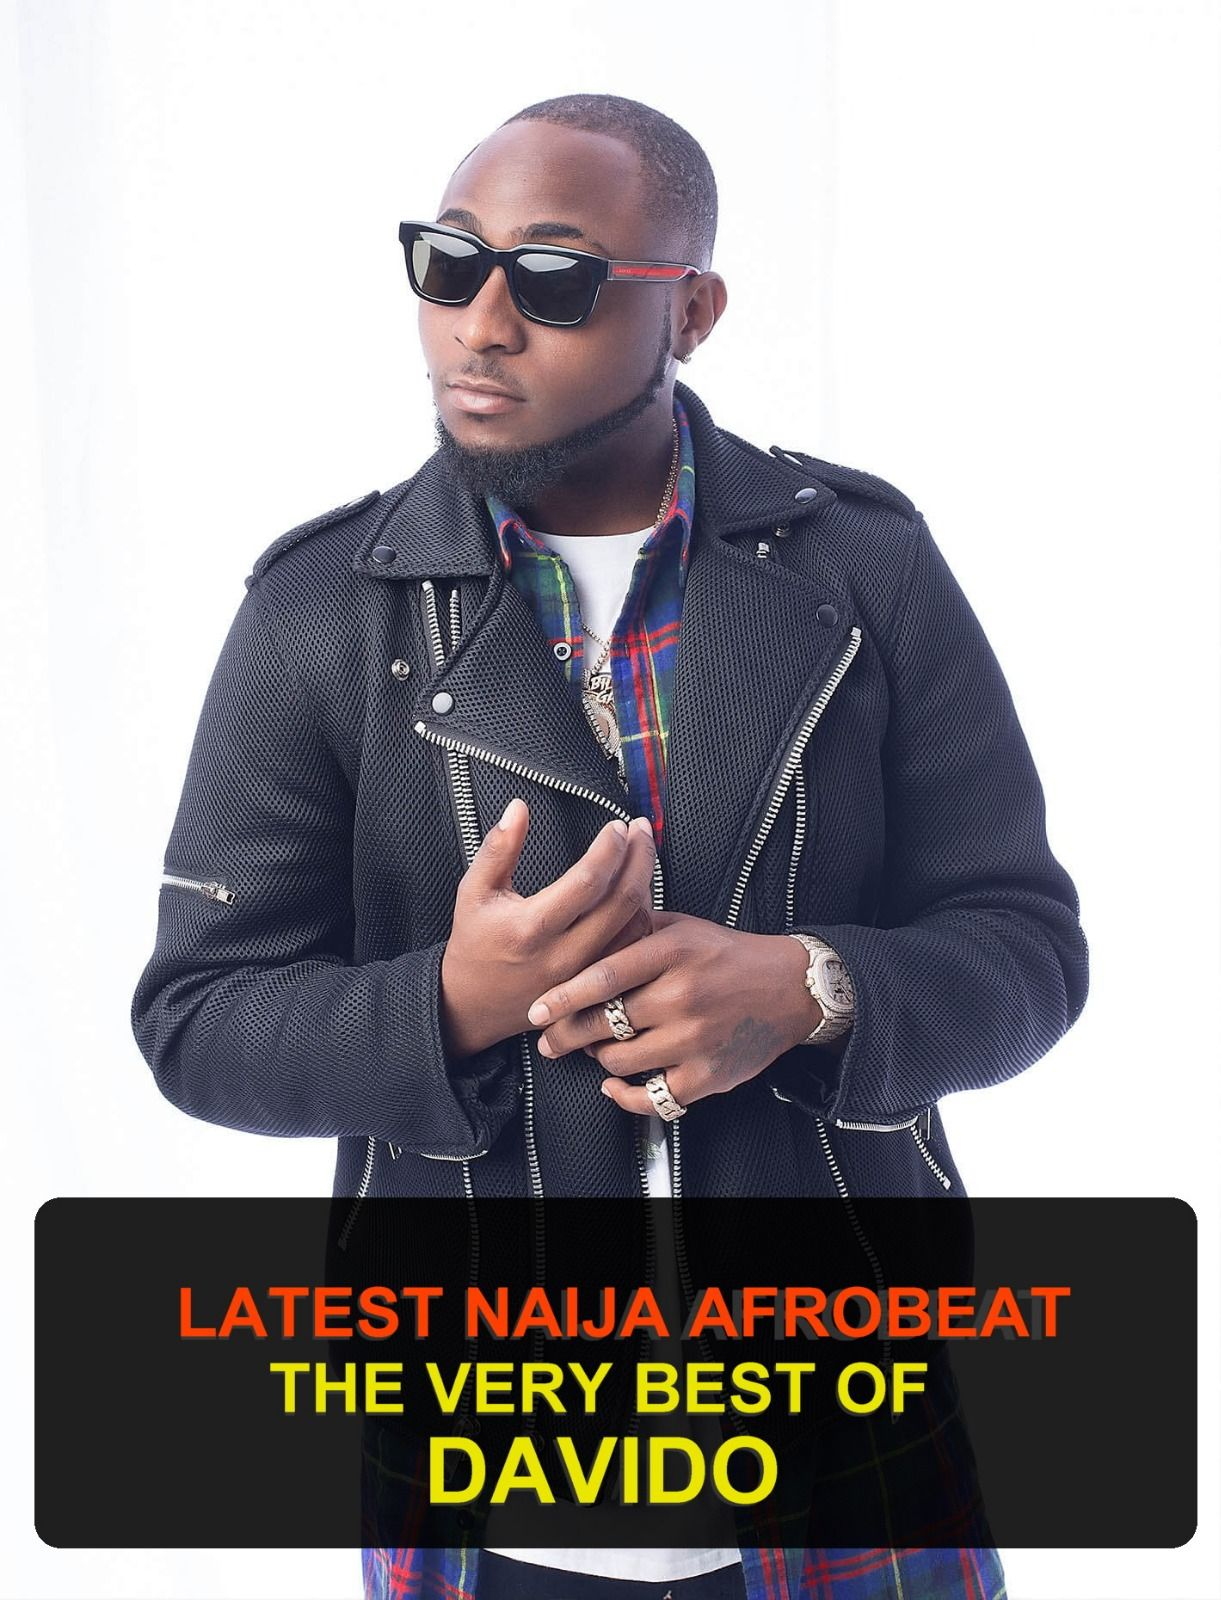 Latest Naija Afrobeat 2019 (the very best of Davido) by Dj Malonda